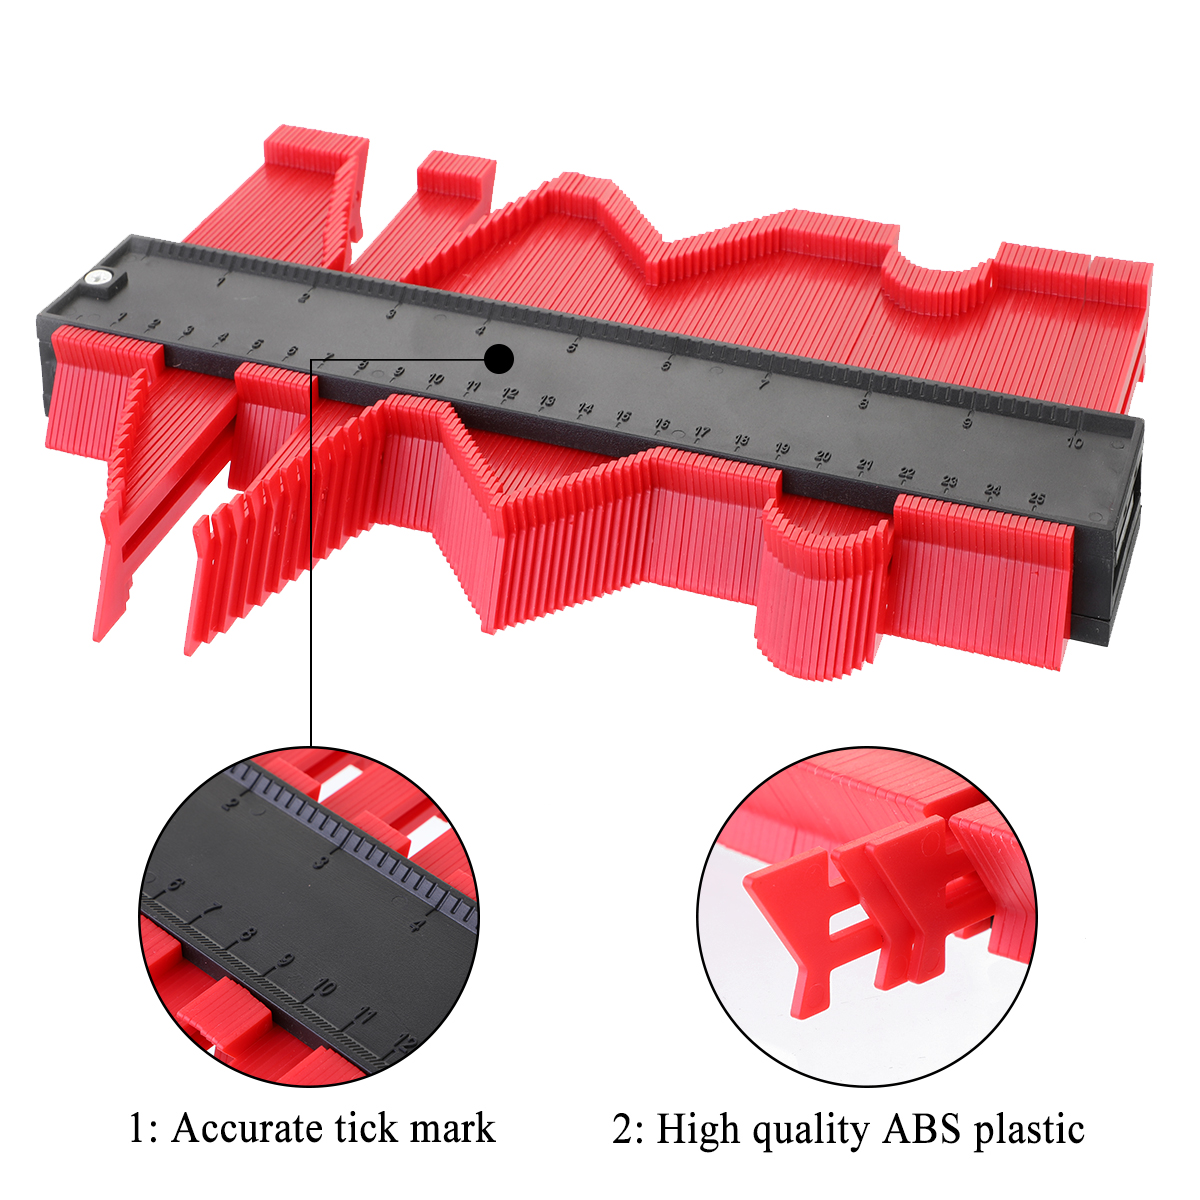 tiling laminado carpintaria ferramenta